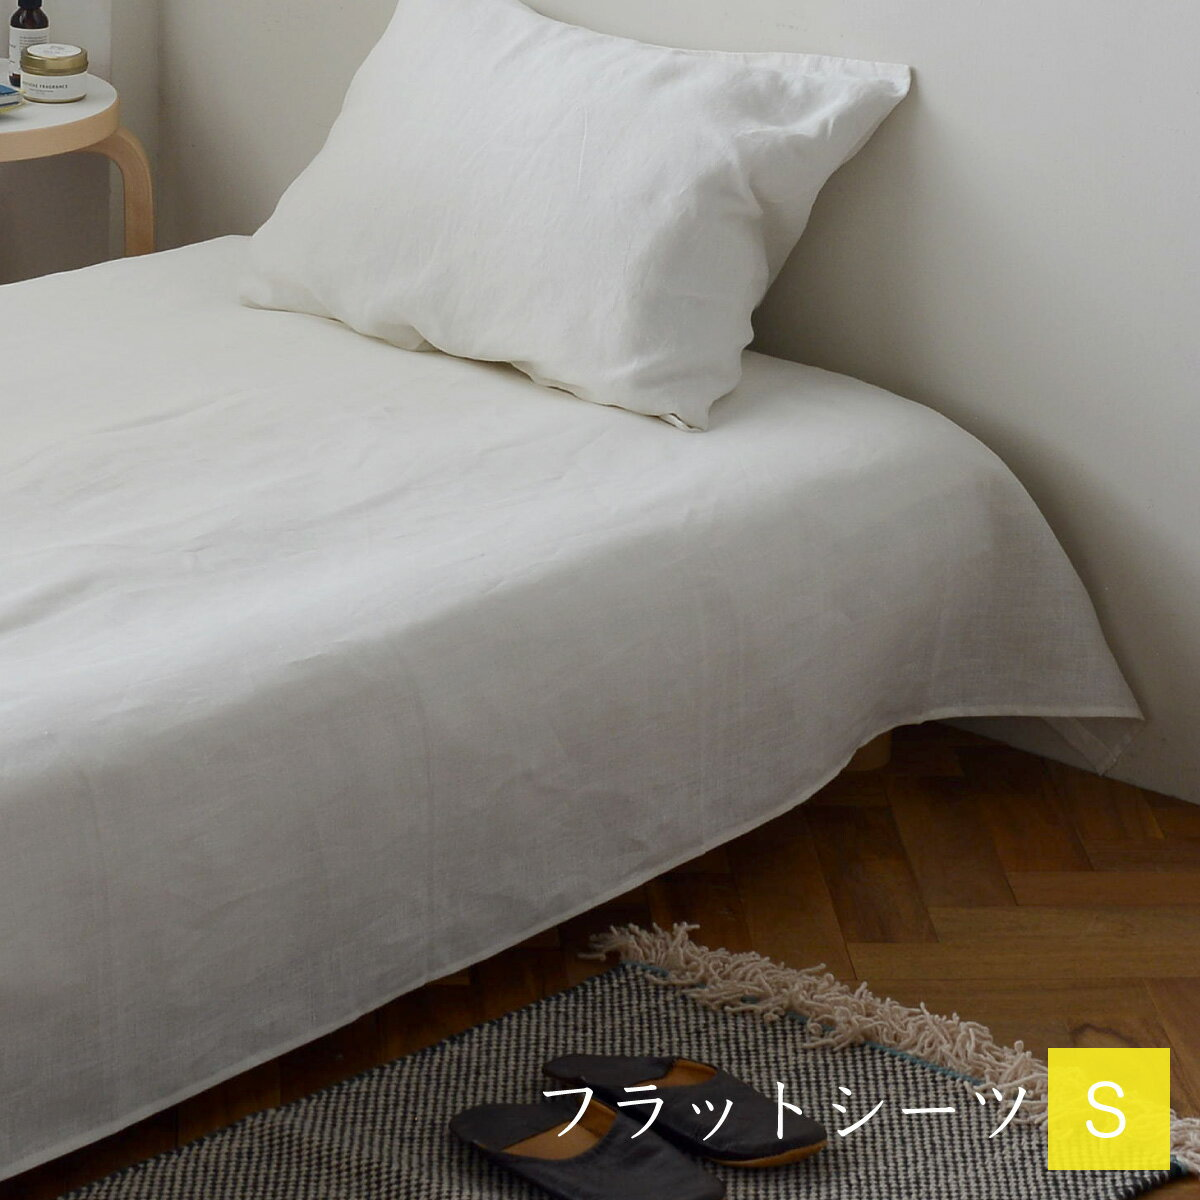 fog linen work(フォグリネンワーク) リネンシングルシーツ ホワイト [LHB012-19]【シンプルでかわいい速乾性のあるリネンの寝具】